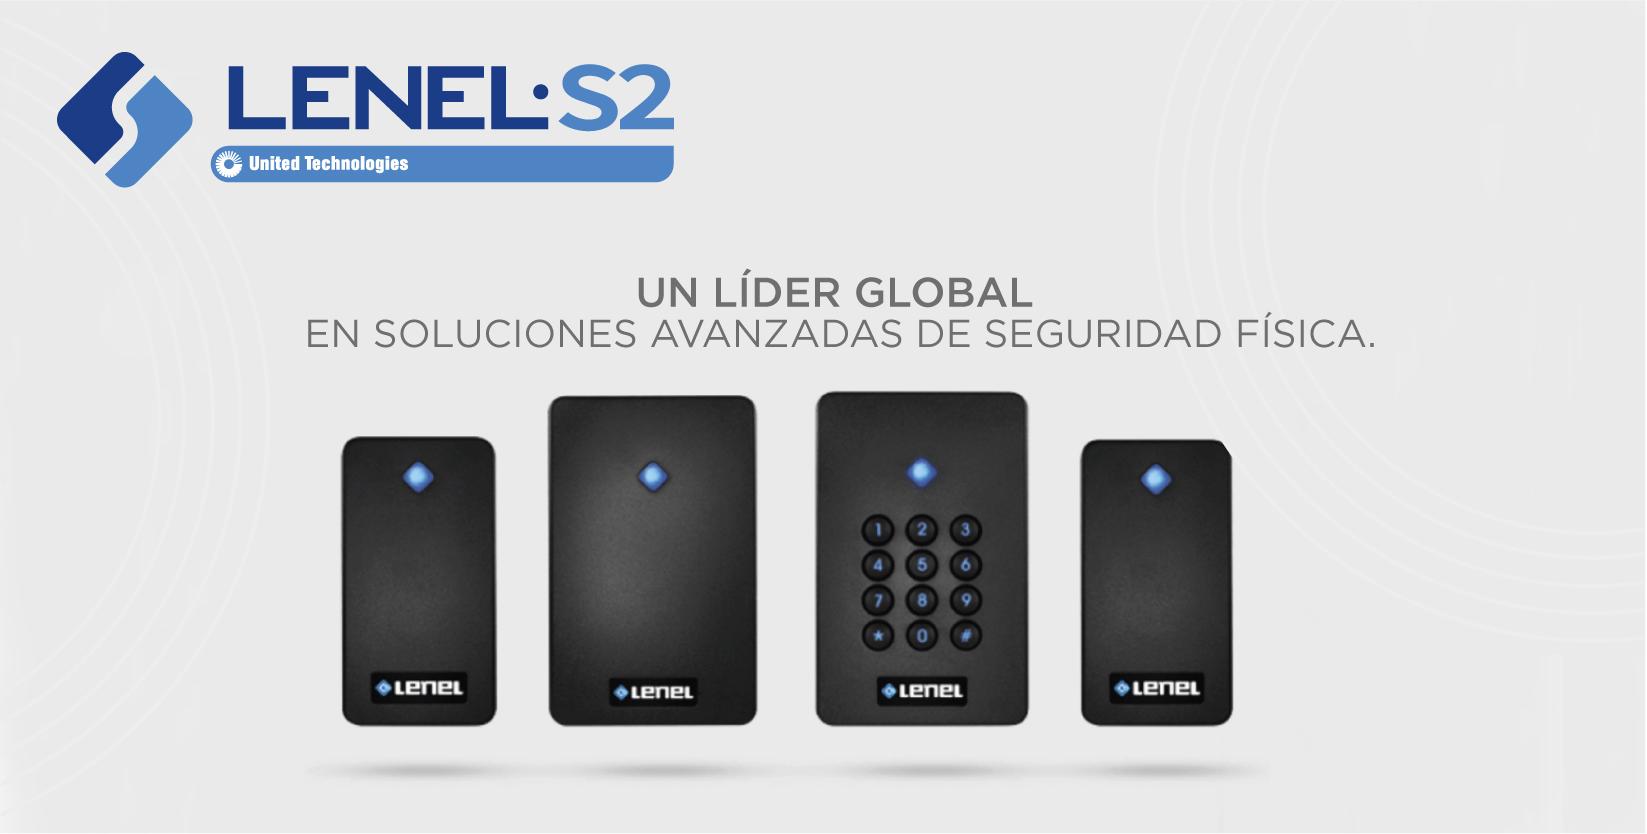 LenelS2